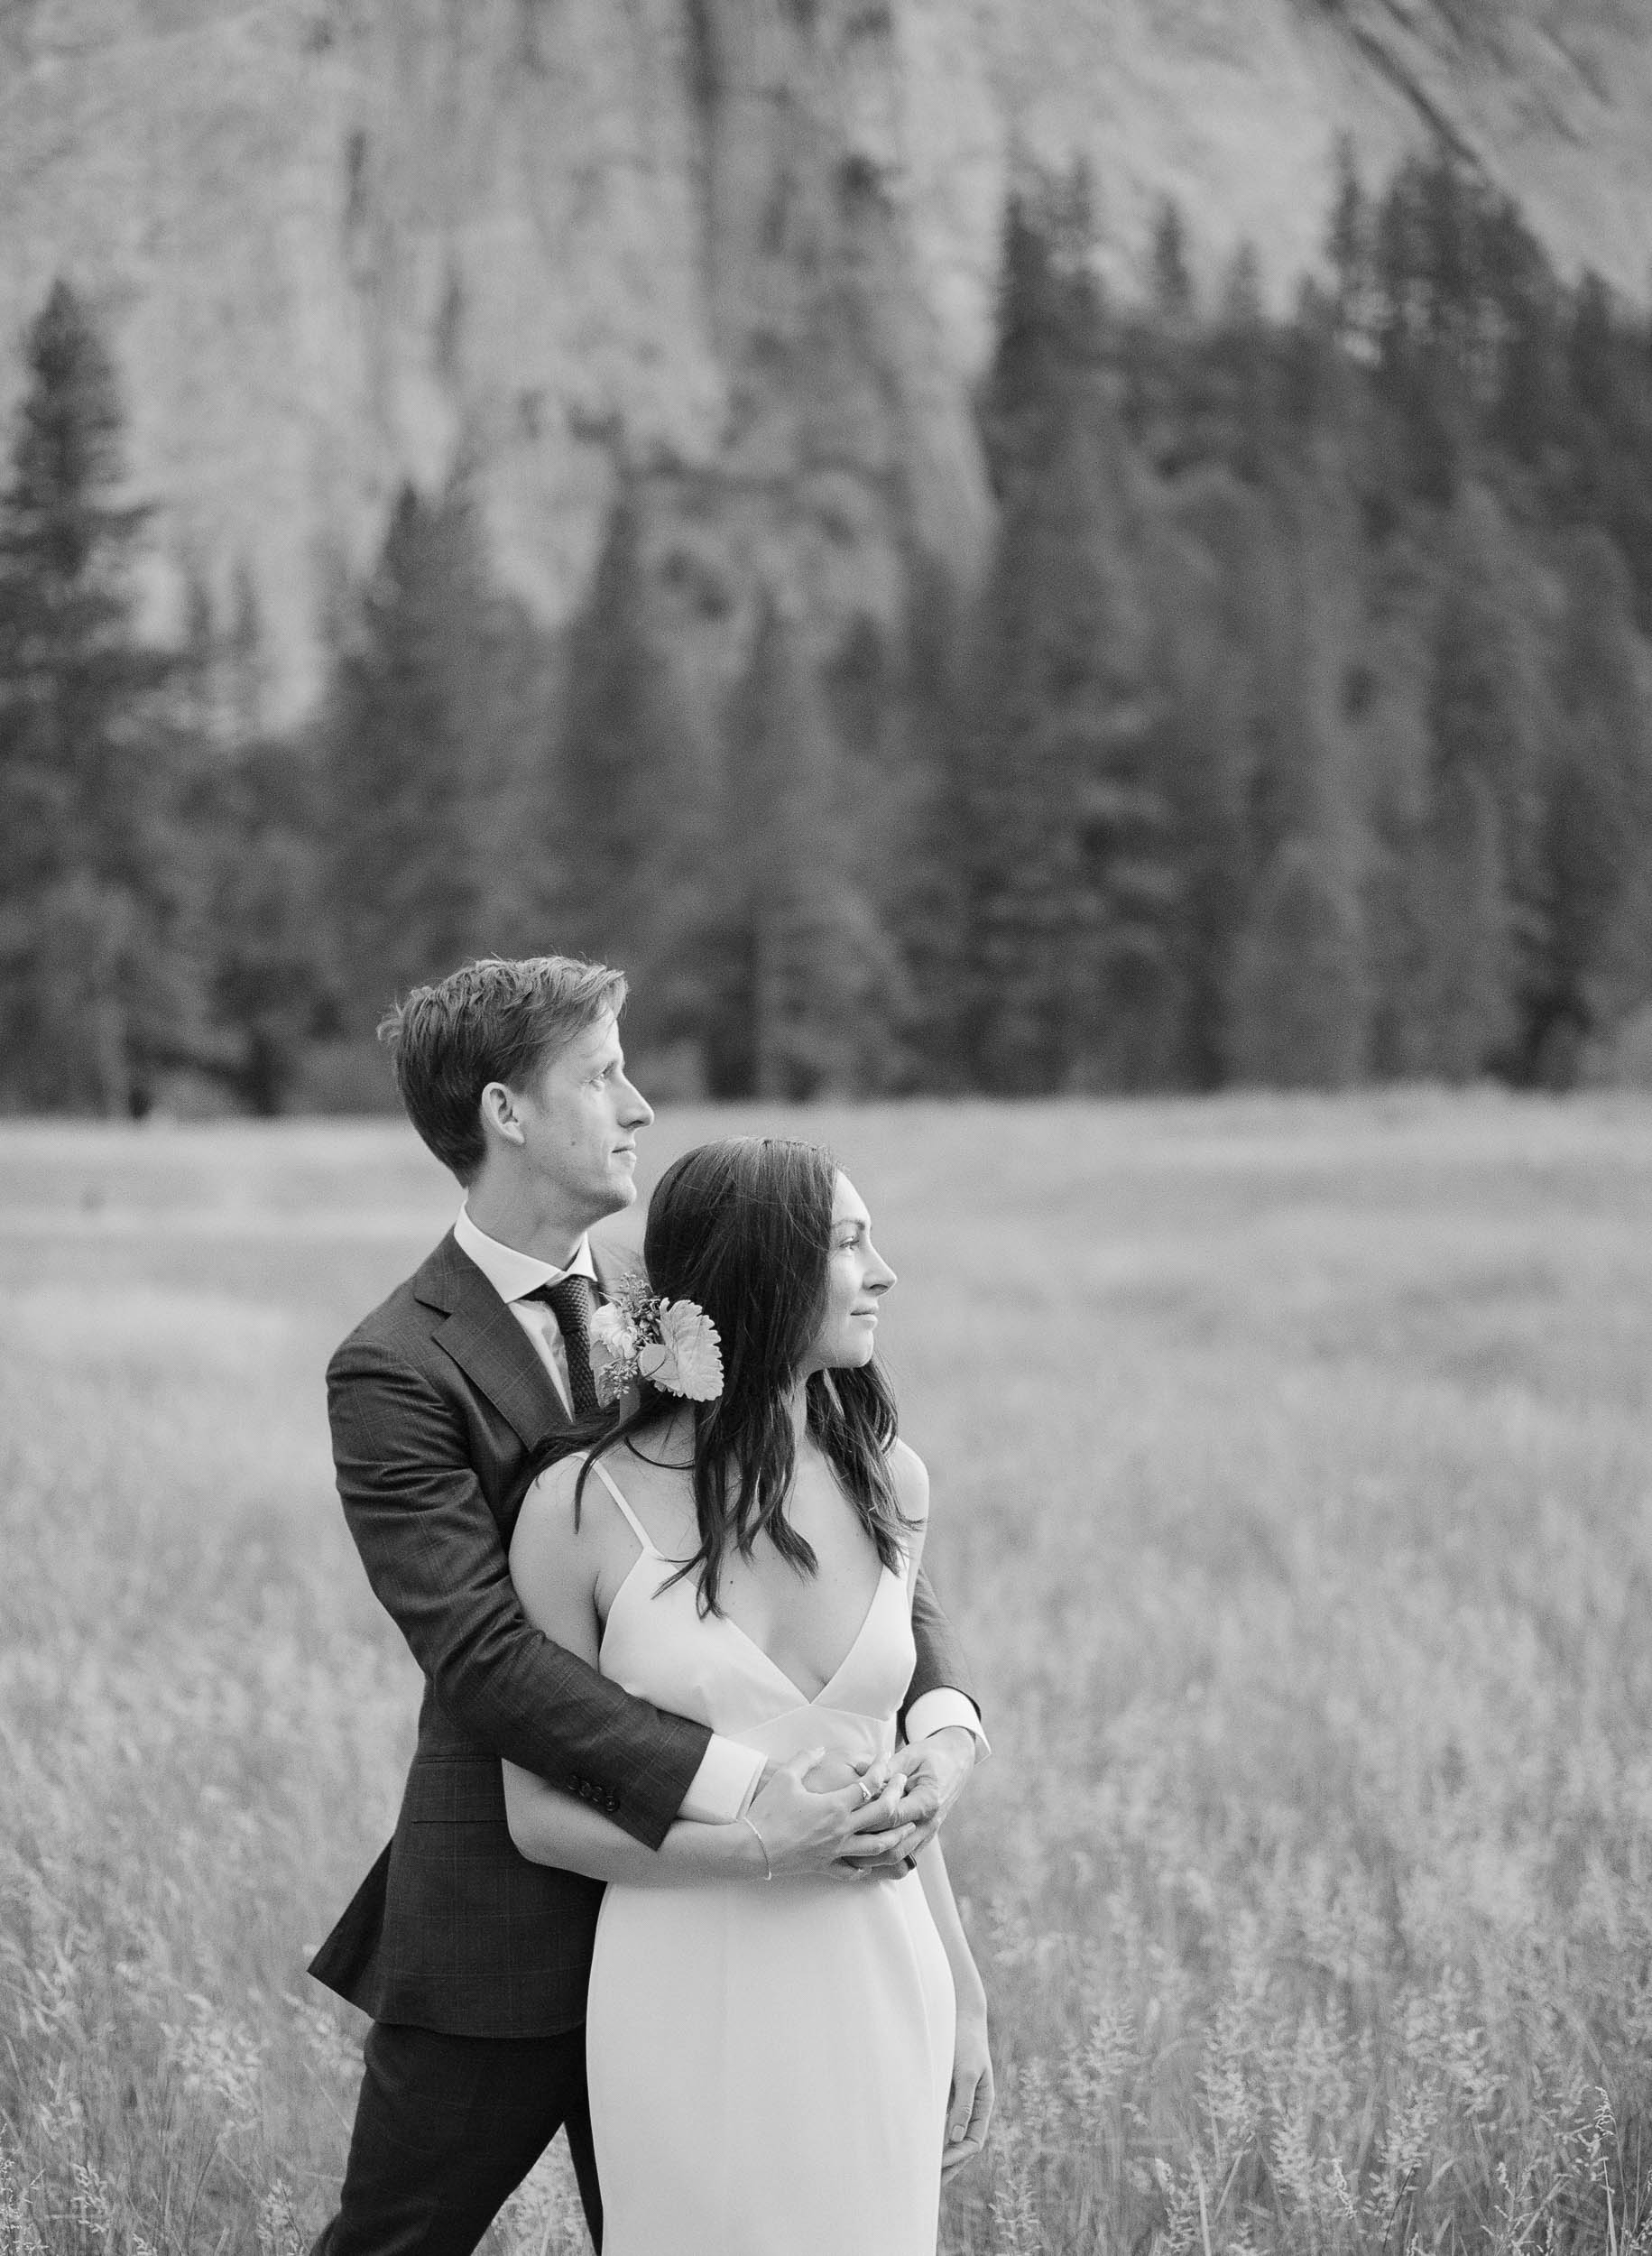 Intimate Yosemite Wedding_Buena Lane Photography_000063850013.jpg